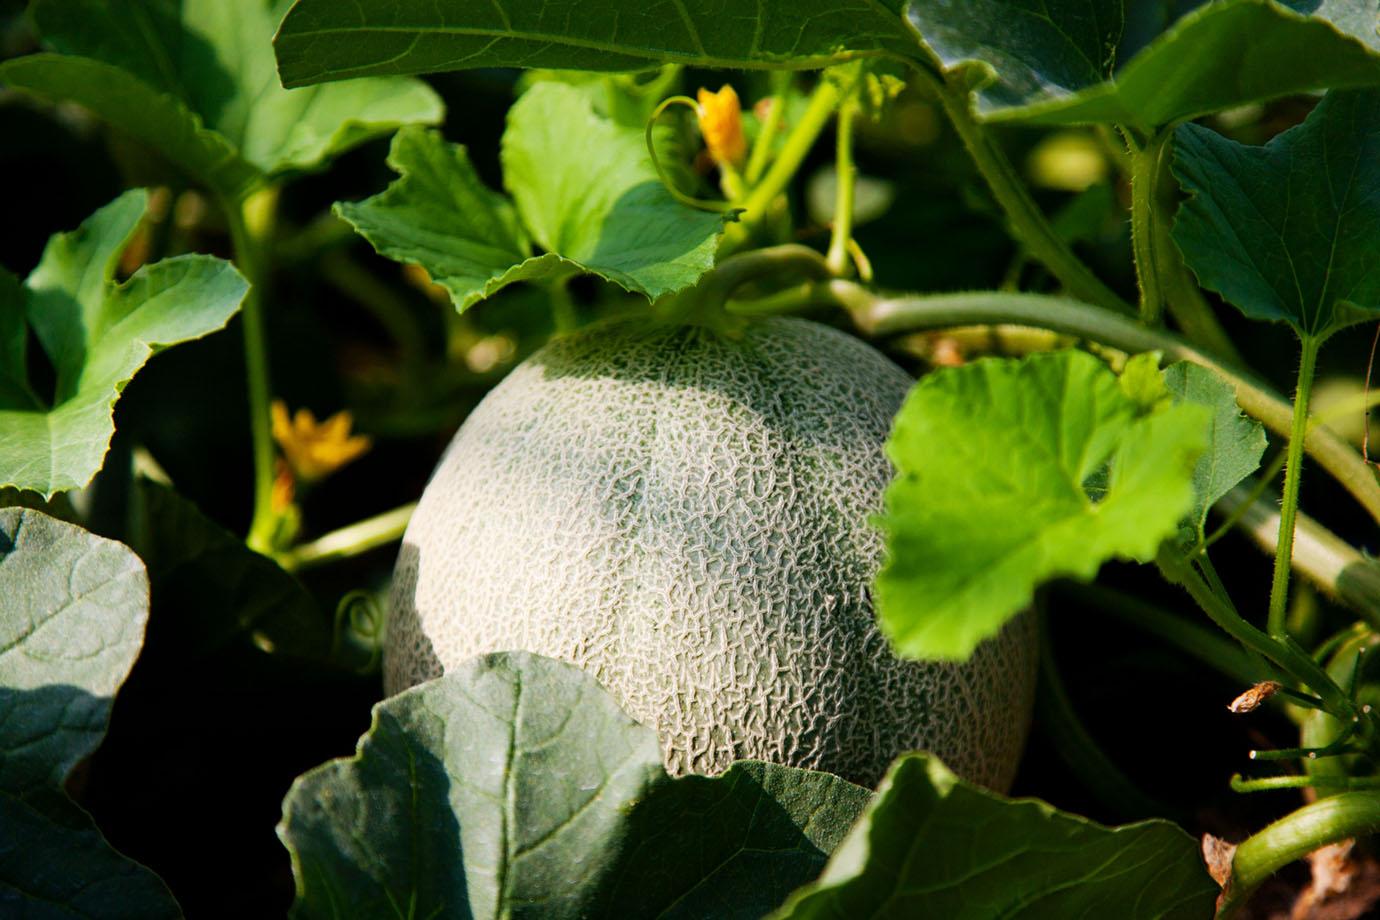 melon-image1